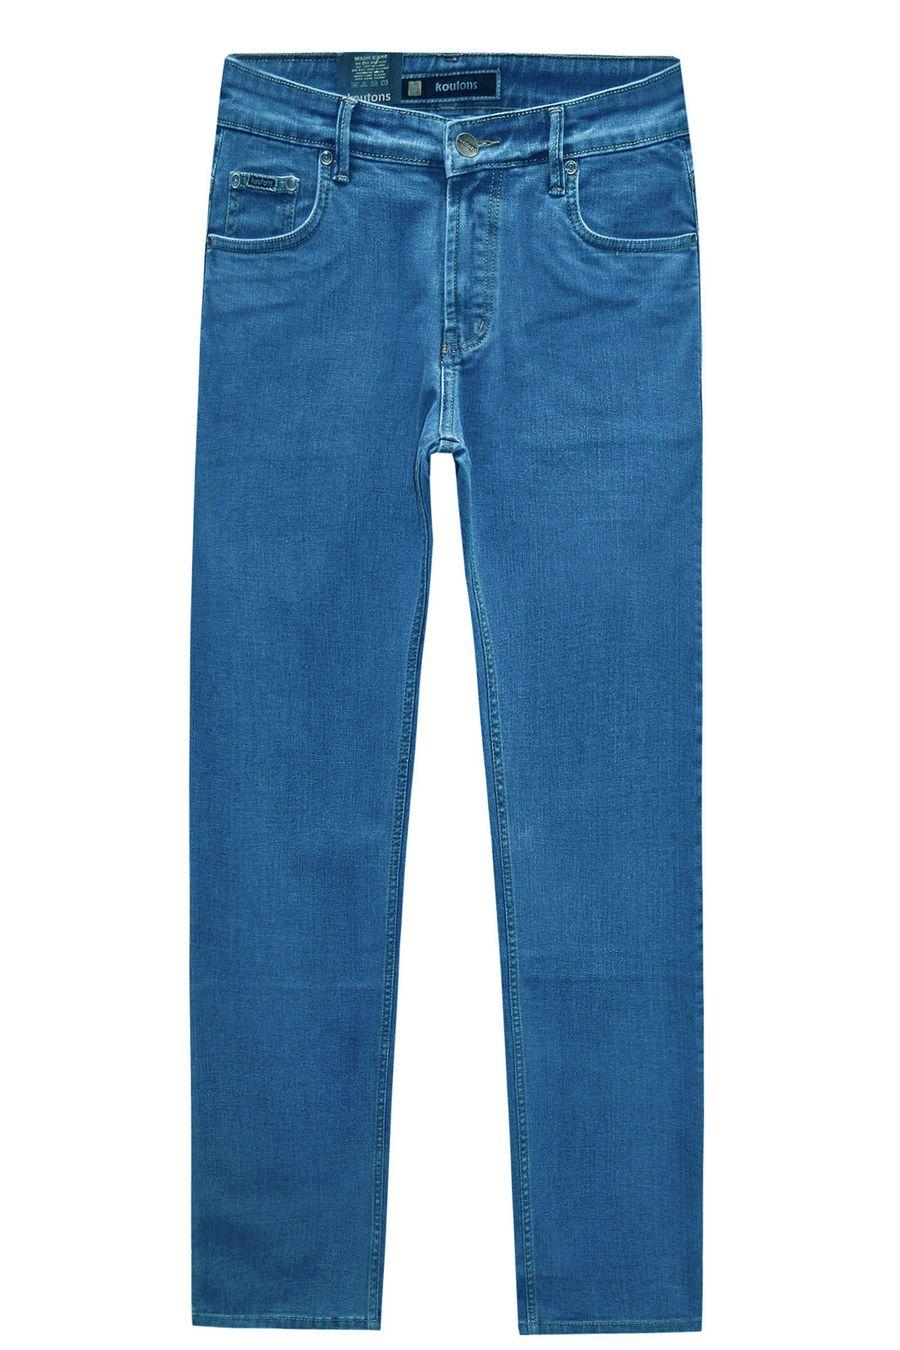 Джинсы мужские Koutons ST-0-590-4 Stretch Blue - фото 1